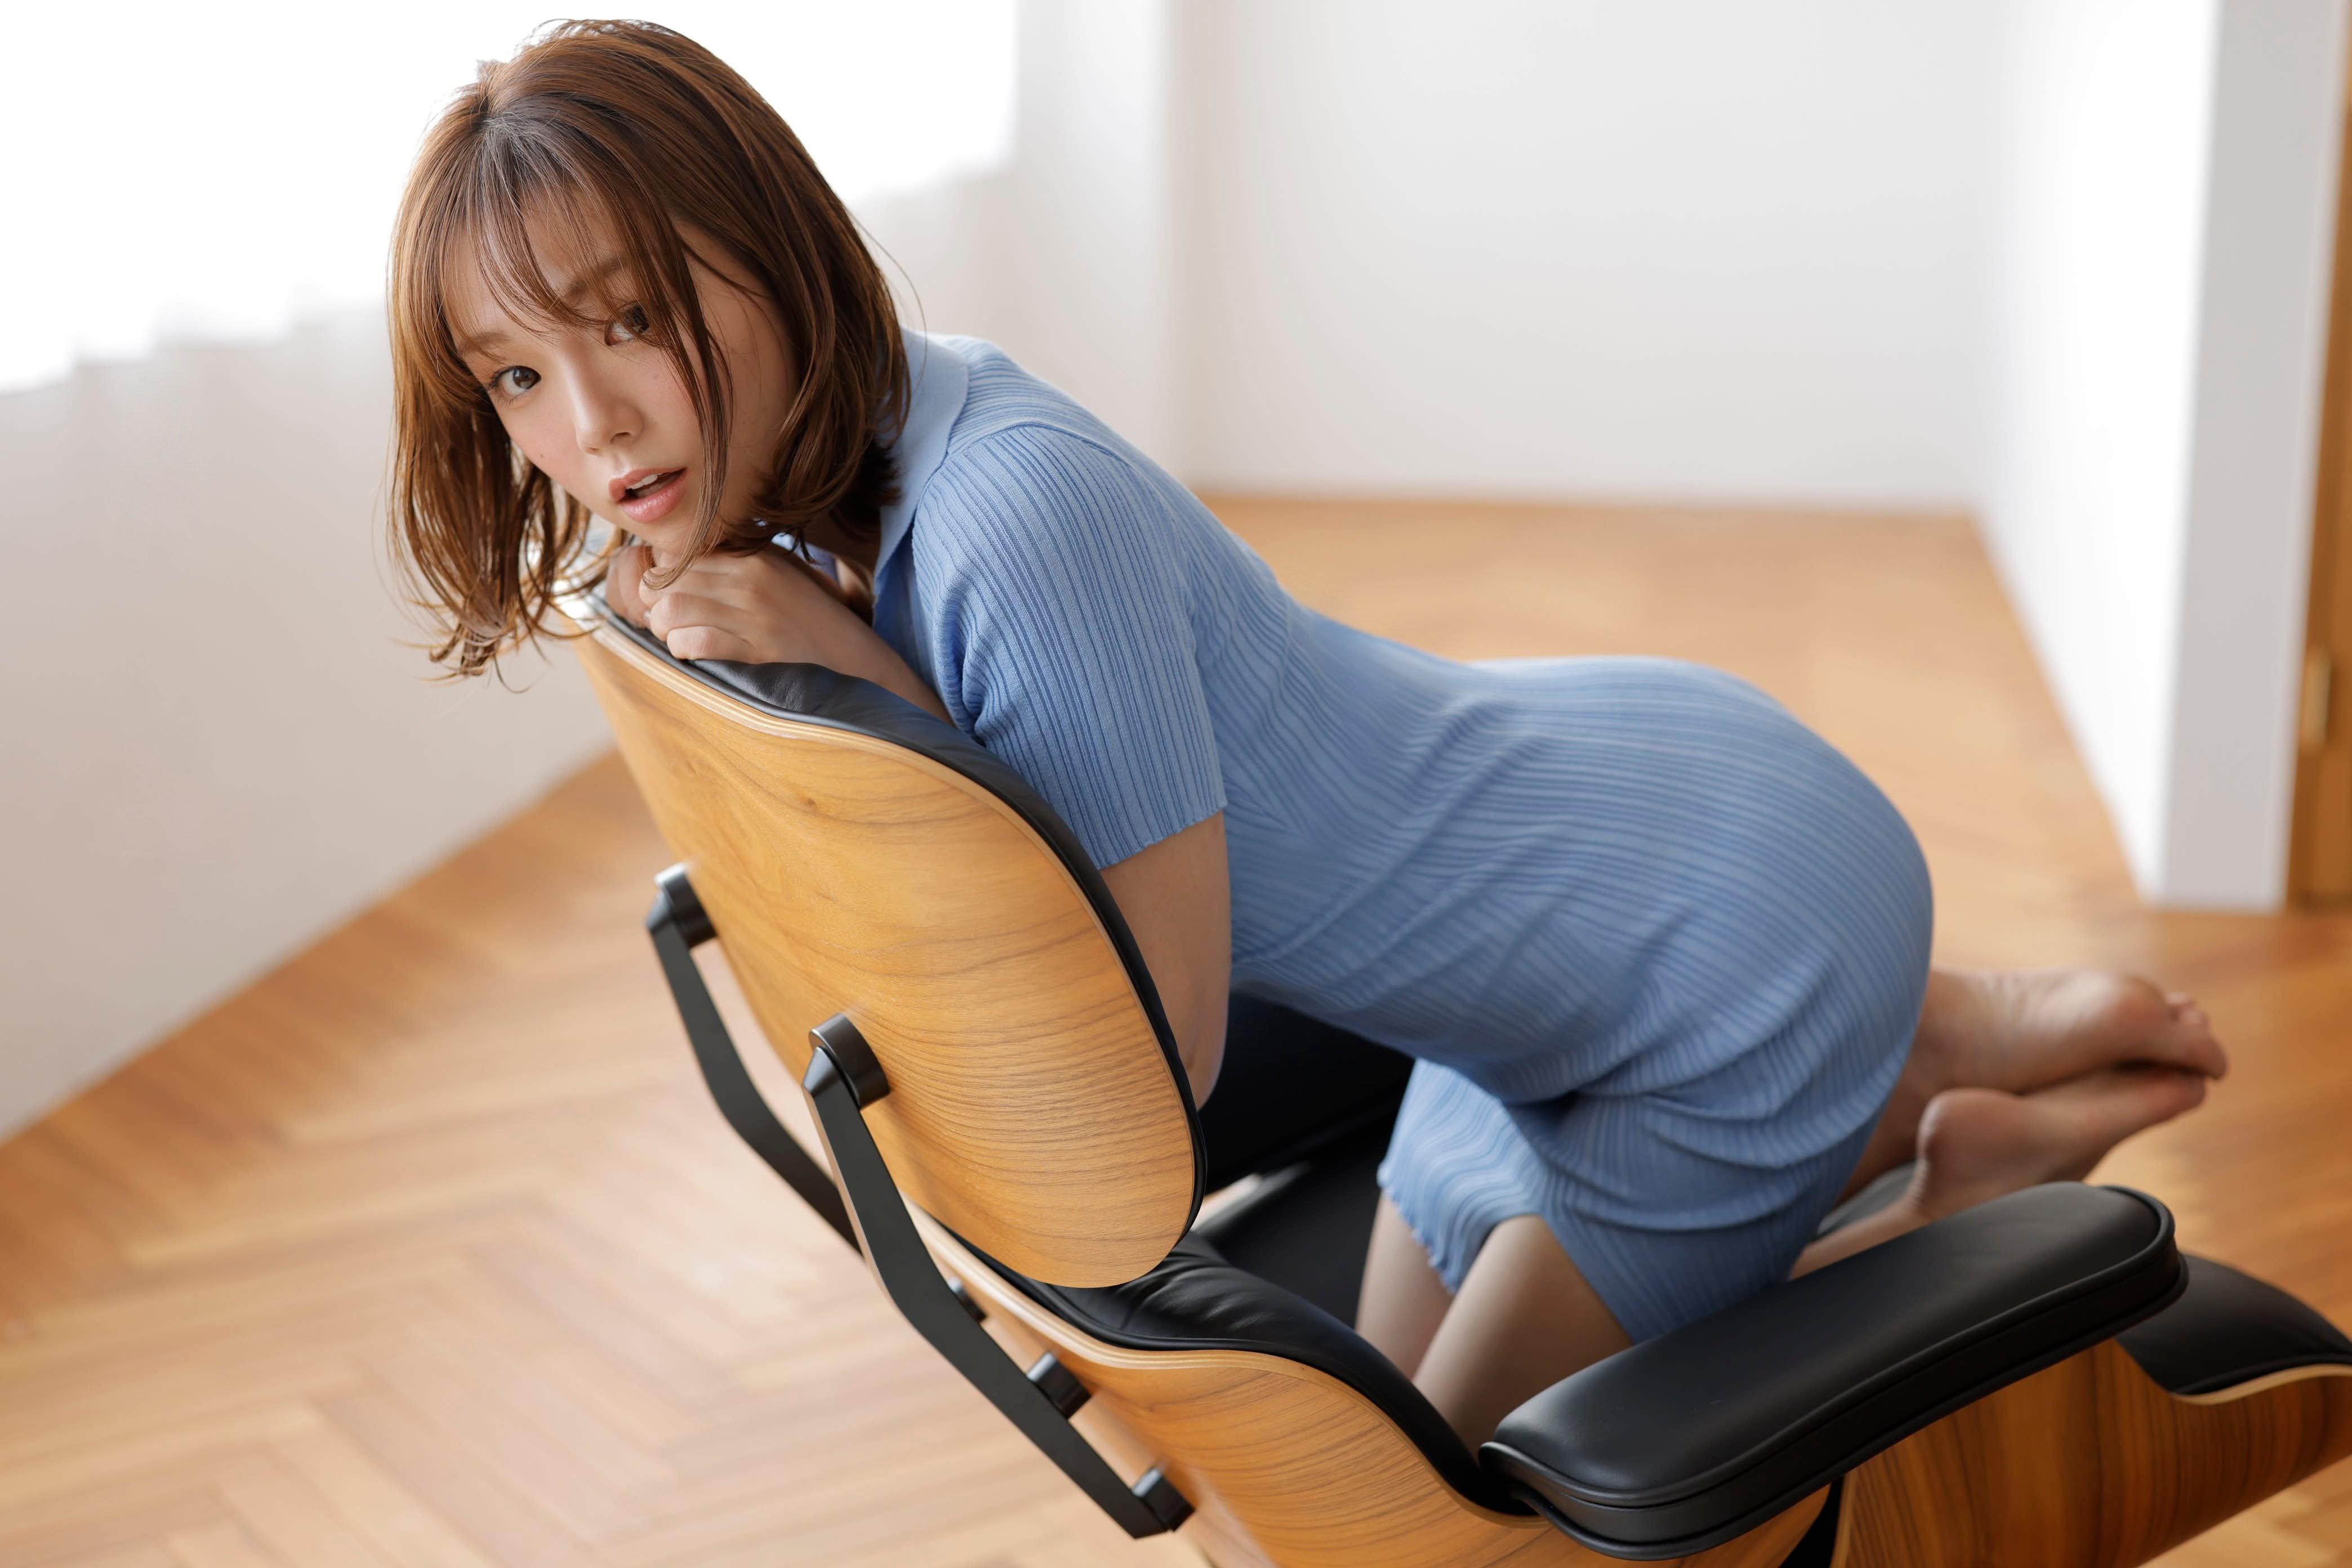 Friday写真杂志周刊 2021.10.8刊 秋天的喜悦~-觅爱图